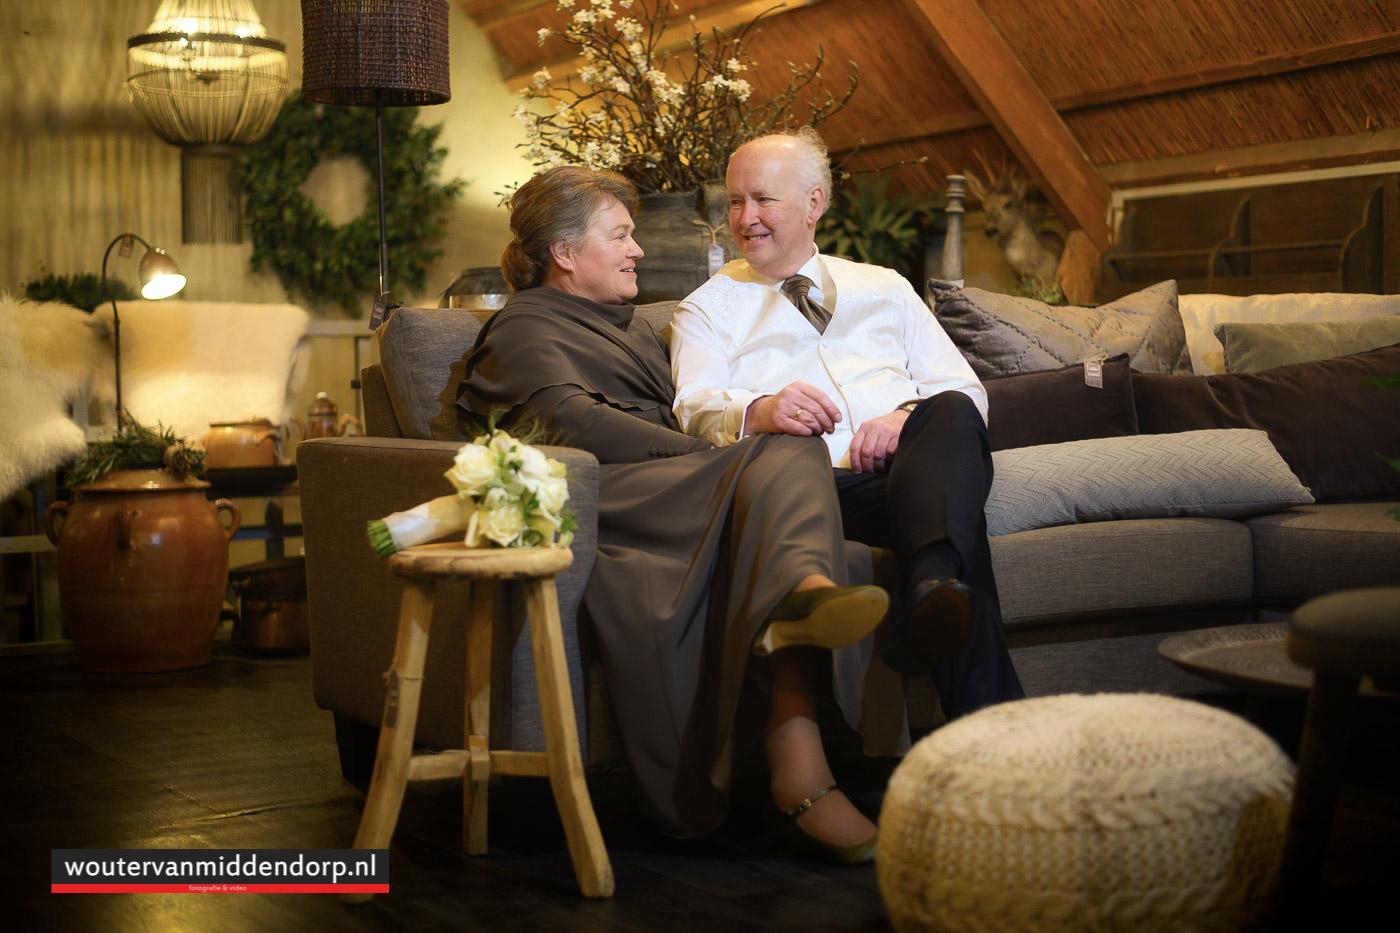 bruidsfotografie Wouter van Middendorp Uddel Elspeet Barneveld, omgeving trouwfotograaf-16